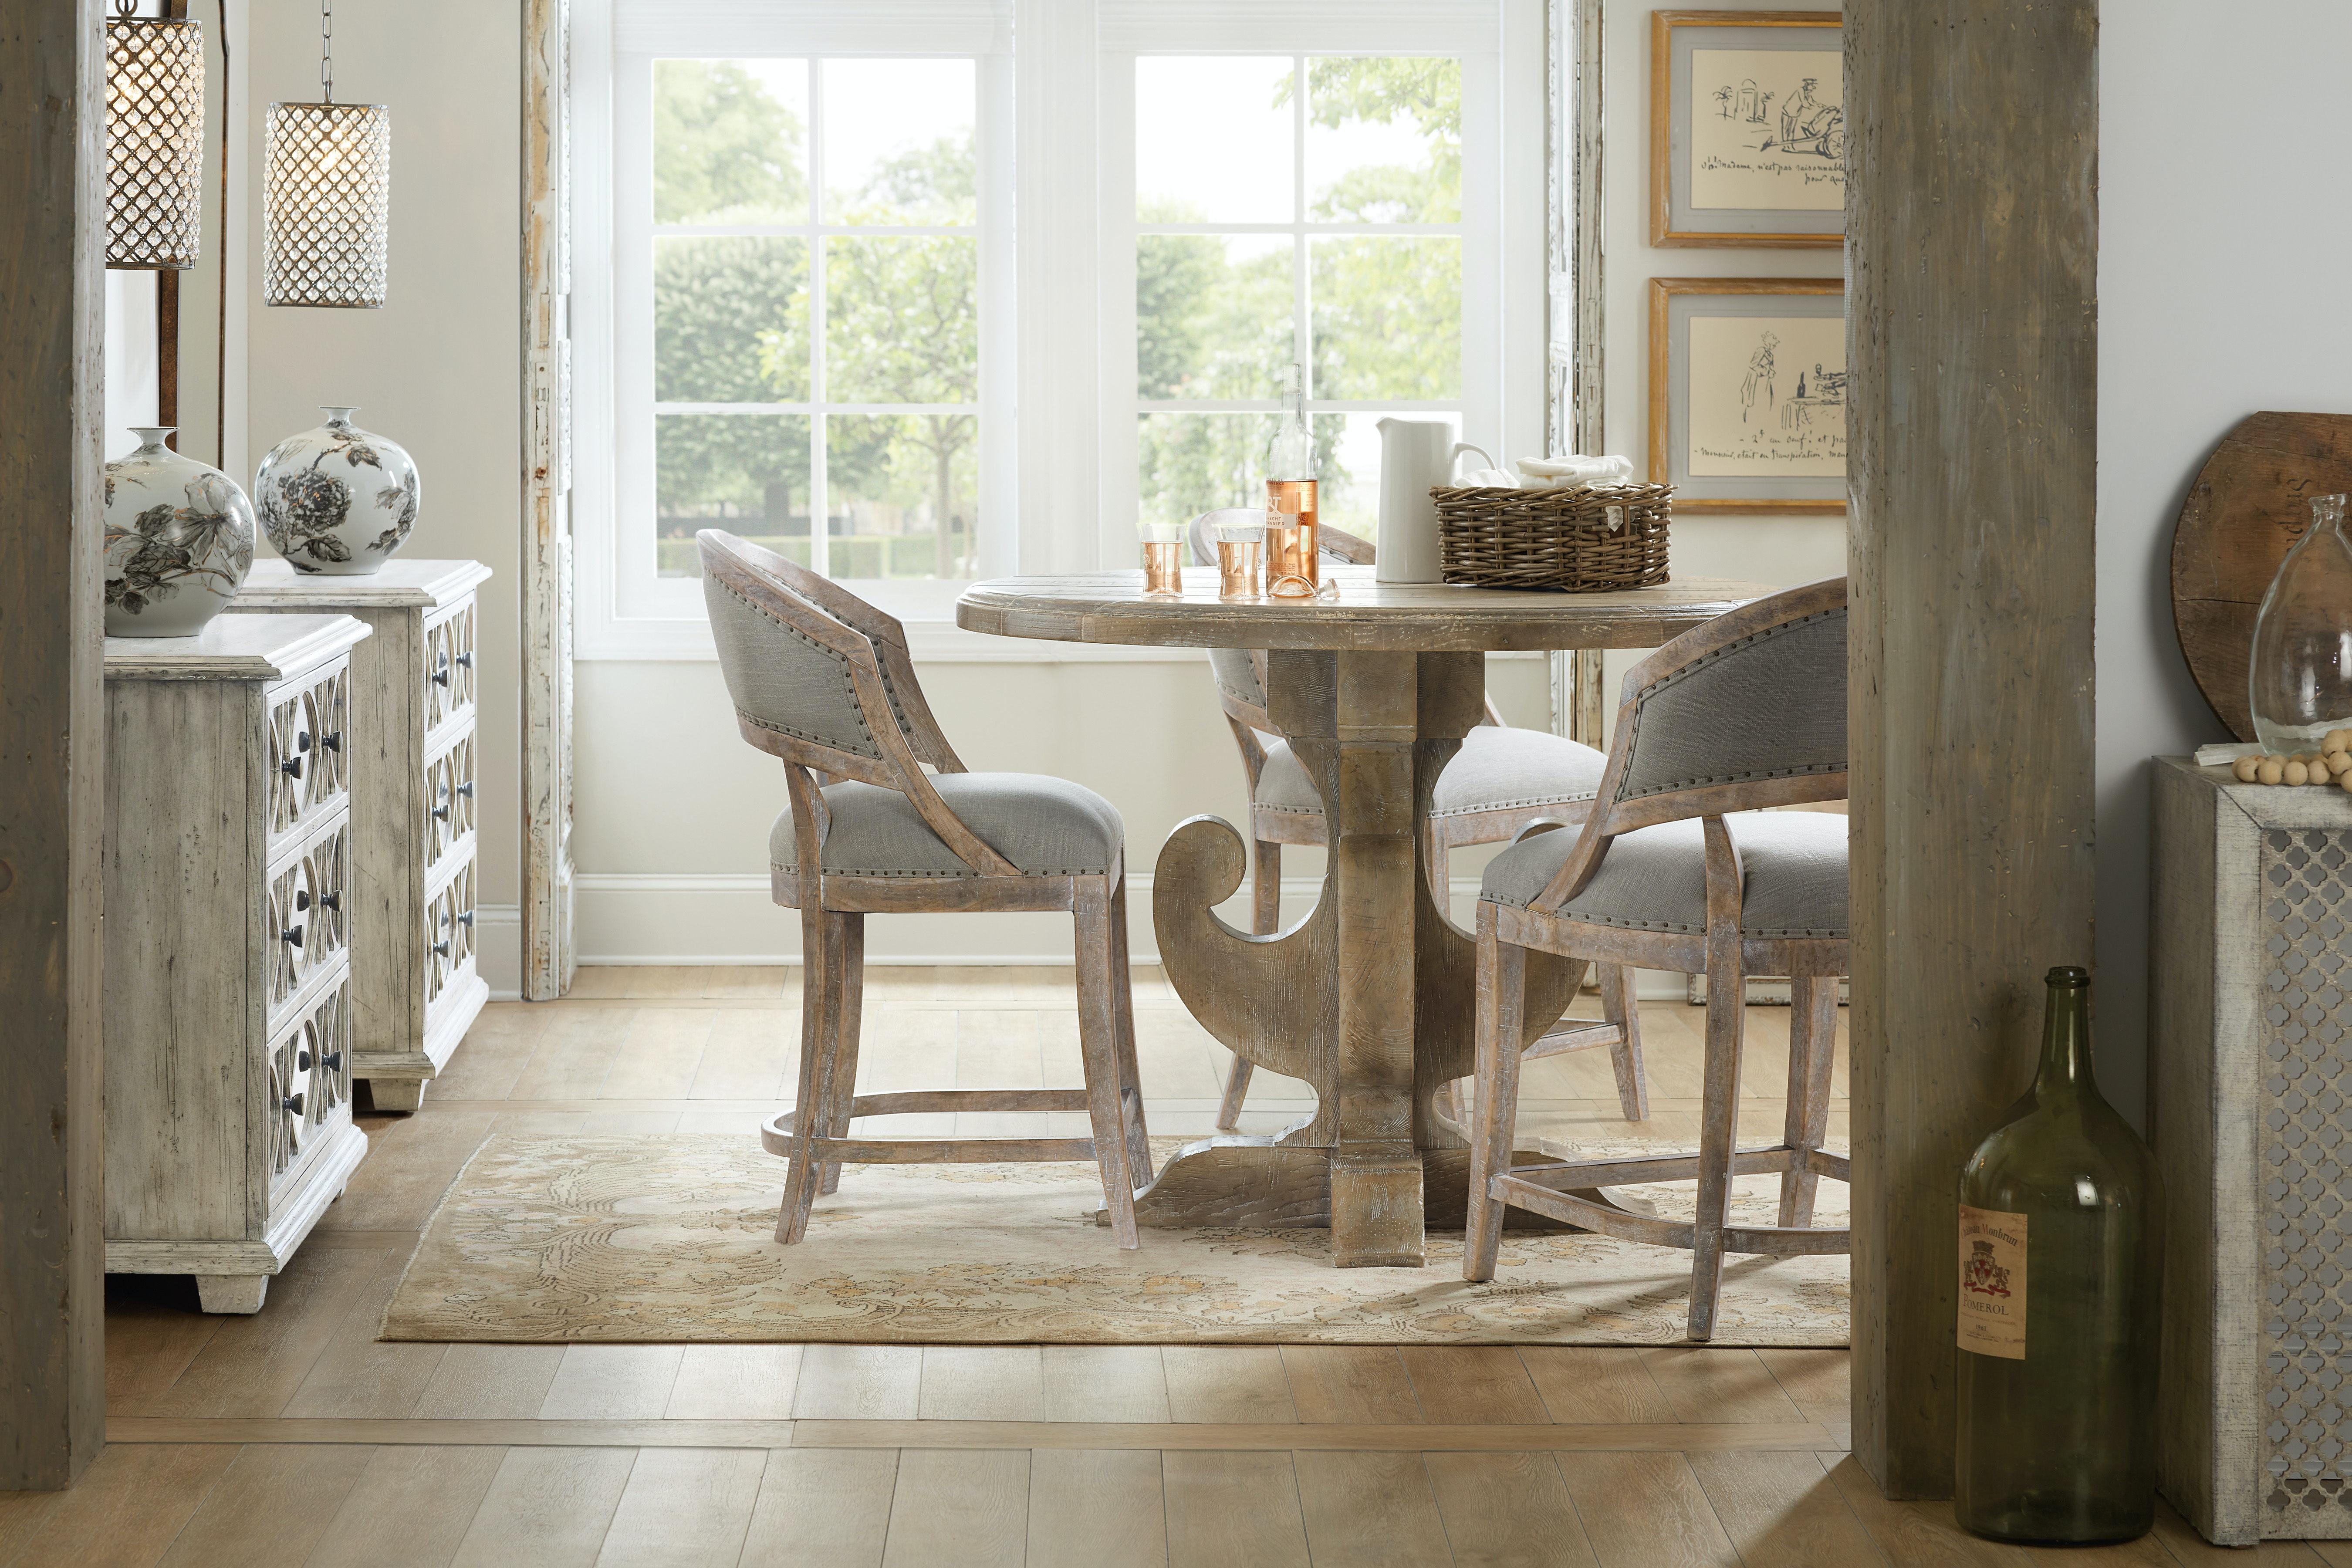 hooker furniture dining room boheme ascension 48in wood round dining table 5750 75203 mwd. Black Bedroom Furniture Sets. Home Design Ideas